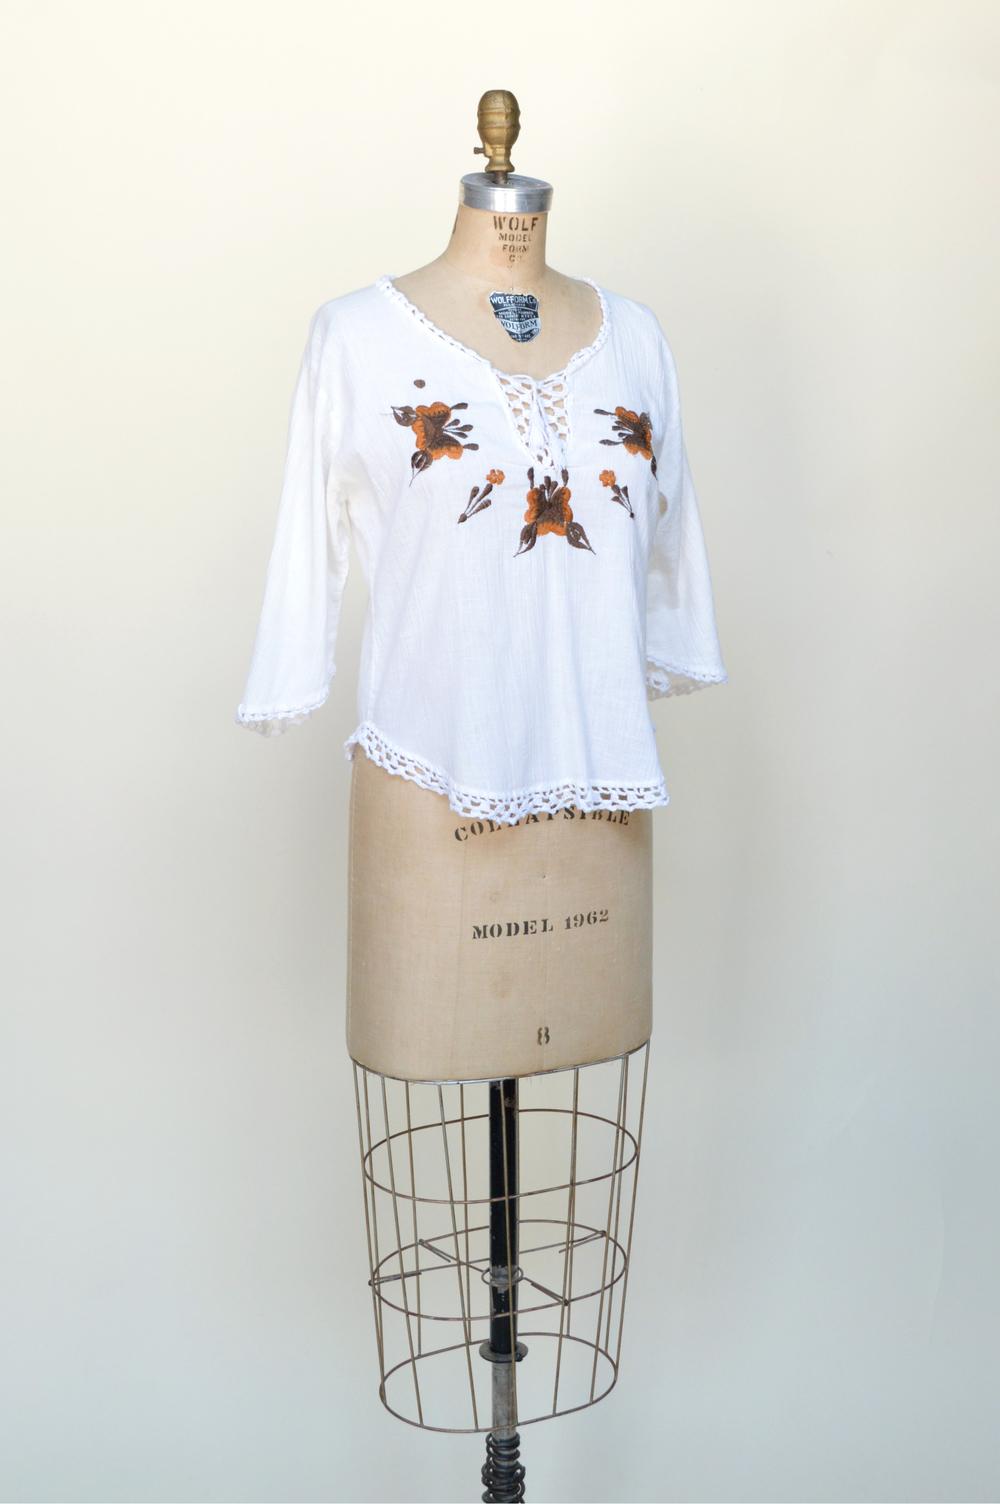 Vintage 1970s blouse from Dalena Vintage